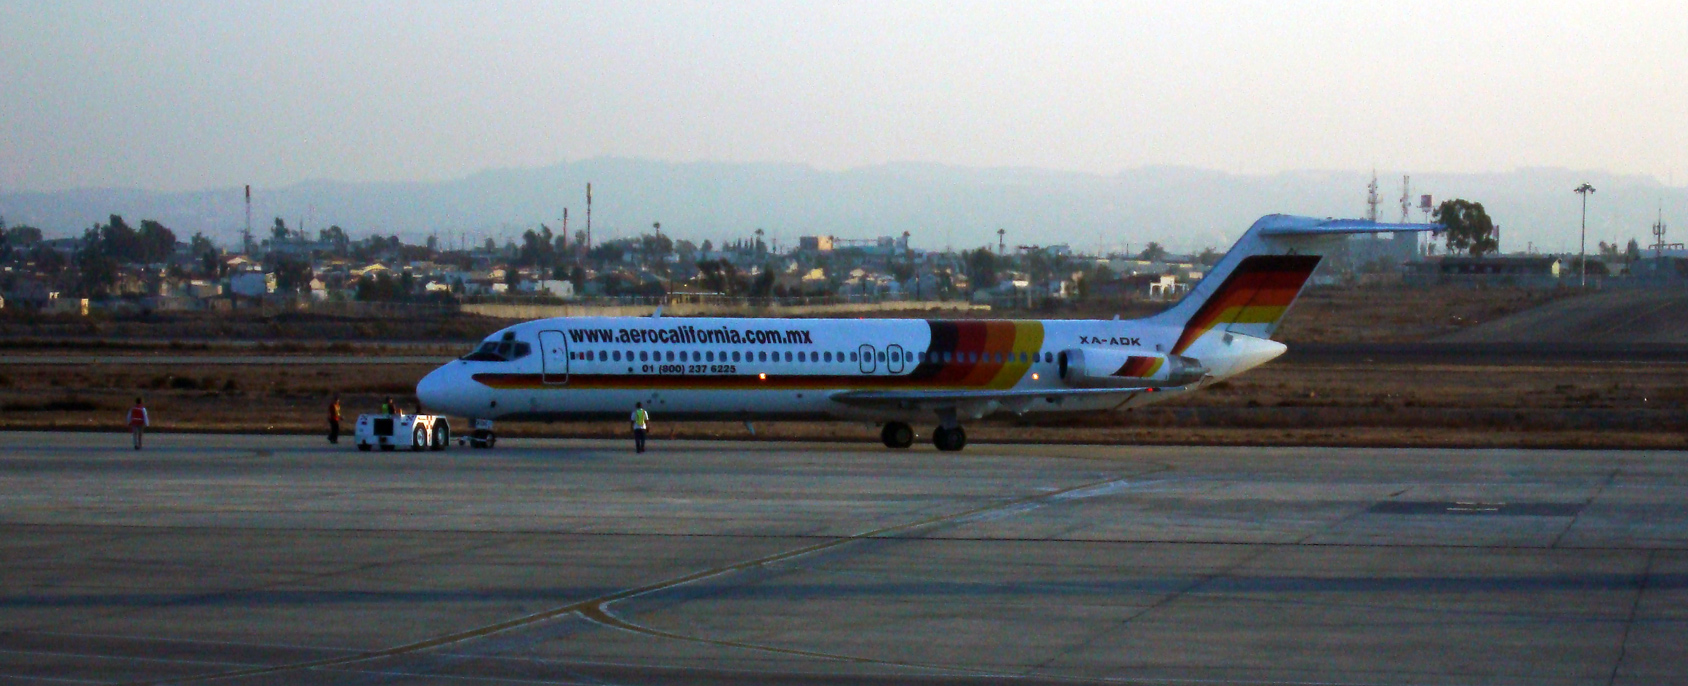 Image of Douglas DC-9 (1/144th scale)